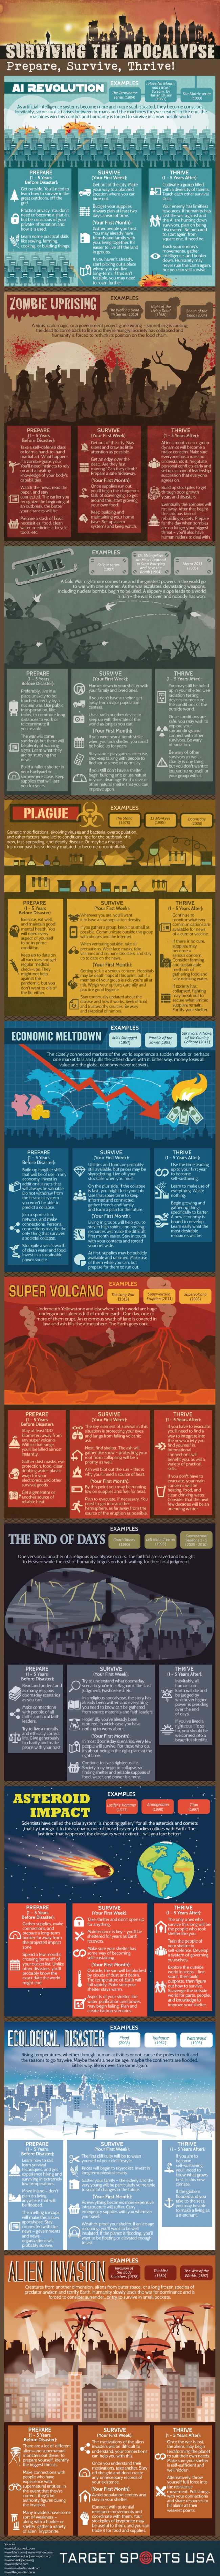 Surviving the Apocalypse: Prepare, Survive, Thrive!